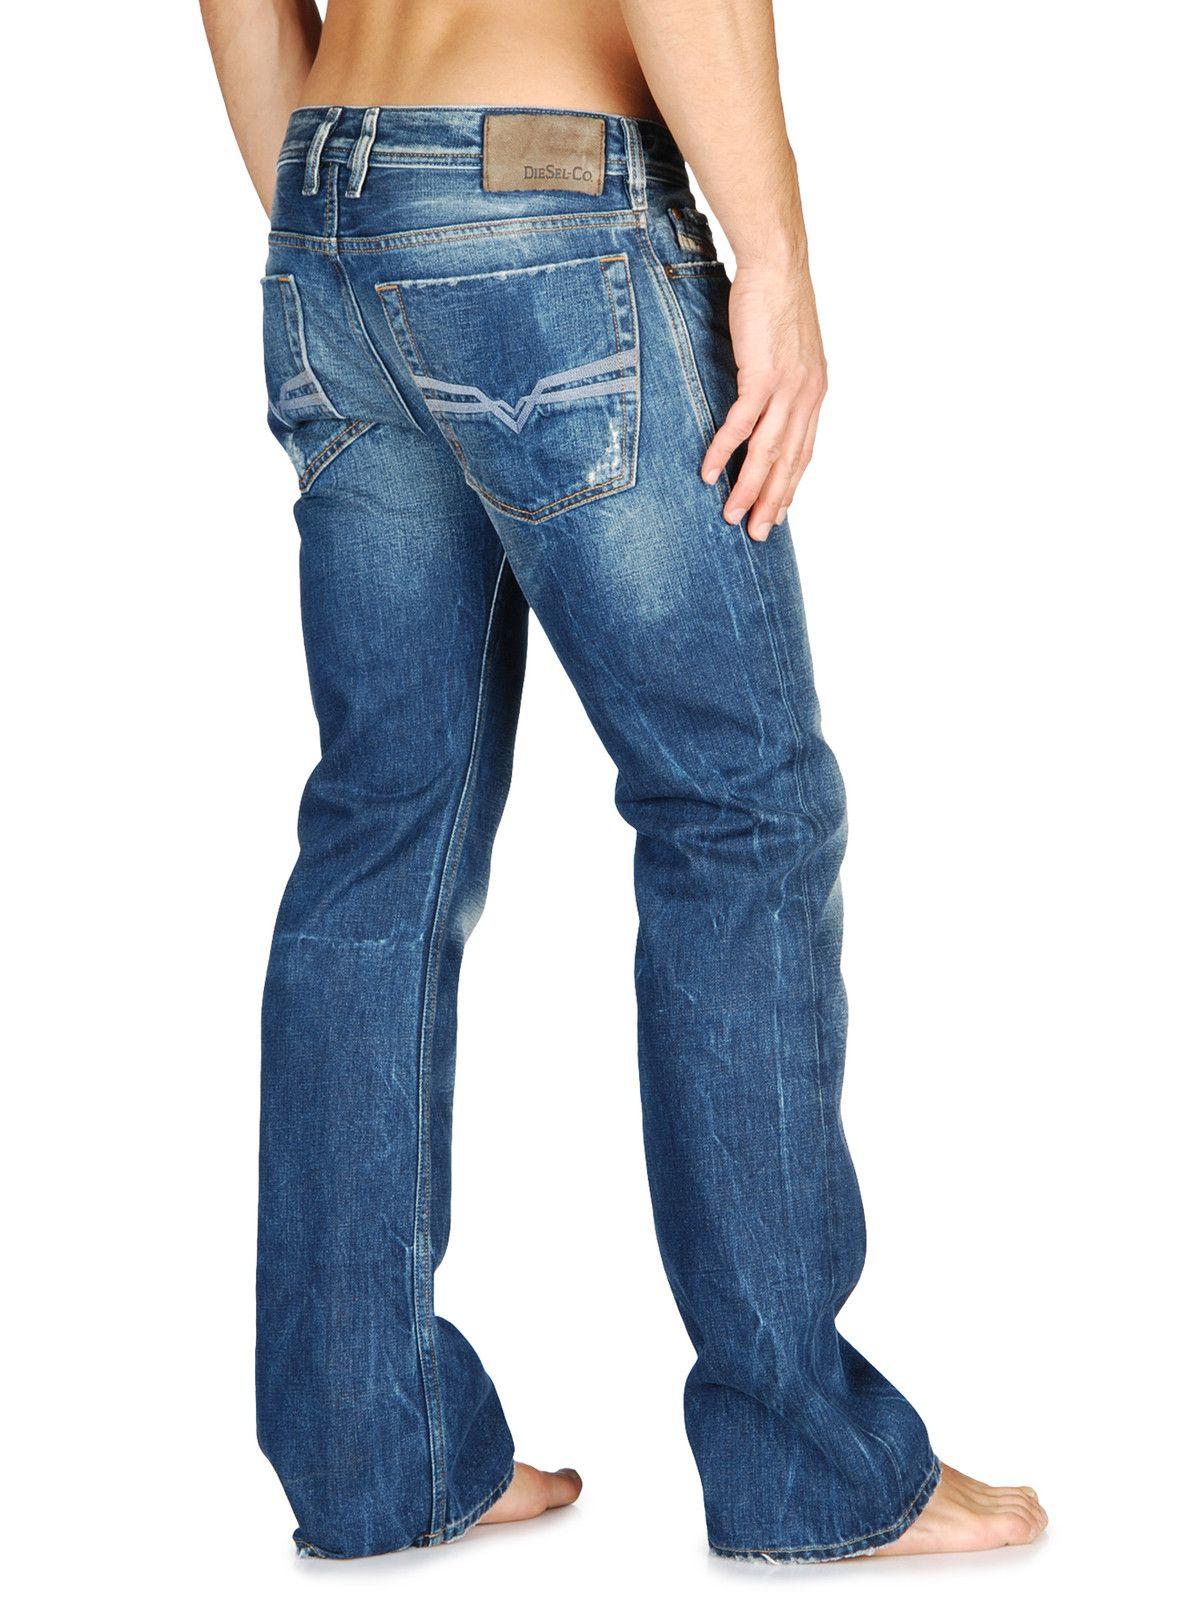 diesel jeans jeans diesel zatiny 885w jeans diesel homme. Black Bedroom Furniture Sets. Home Design Ideas